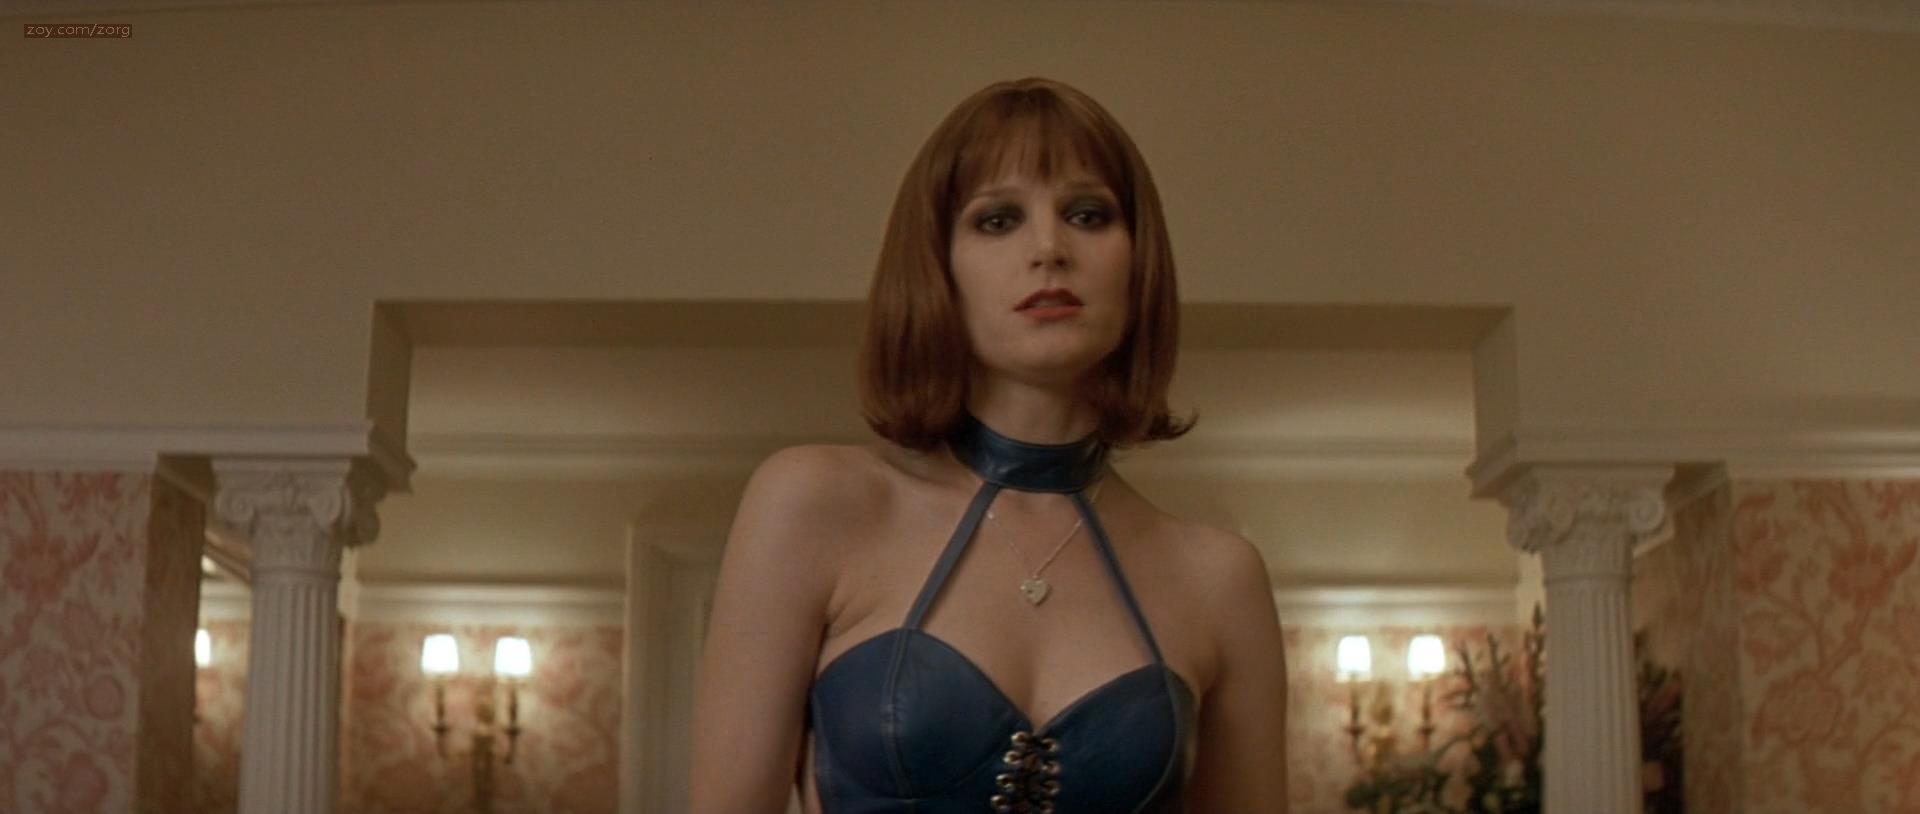 Bridget Fonda hot and sexy and Laurence Ashley hot – Kiss Of the Dragon (2001) hd1080